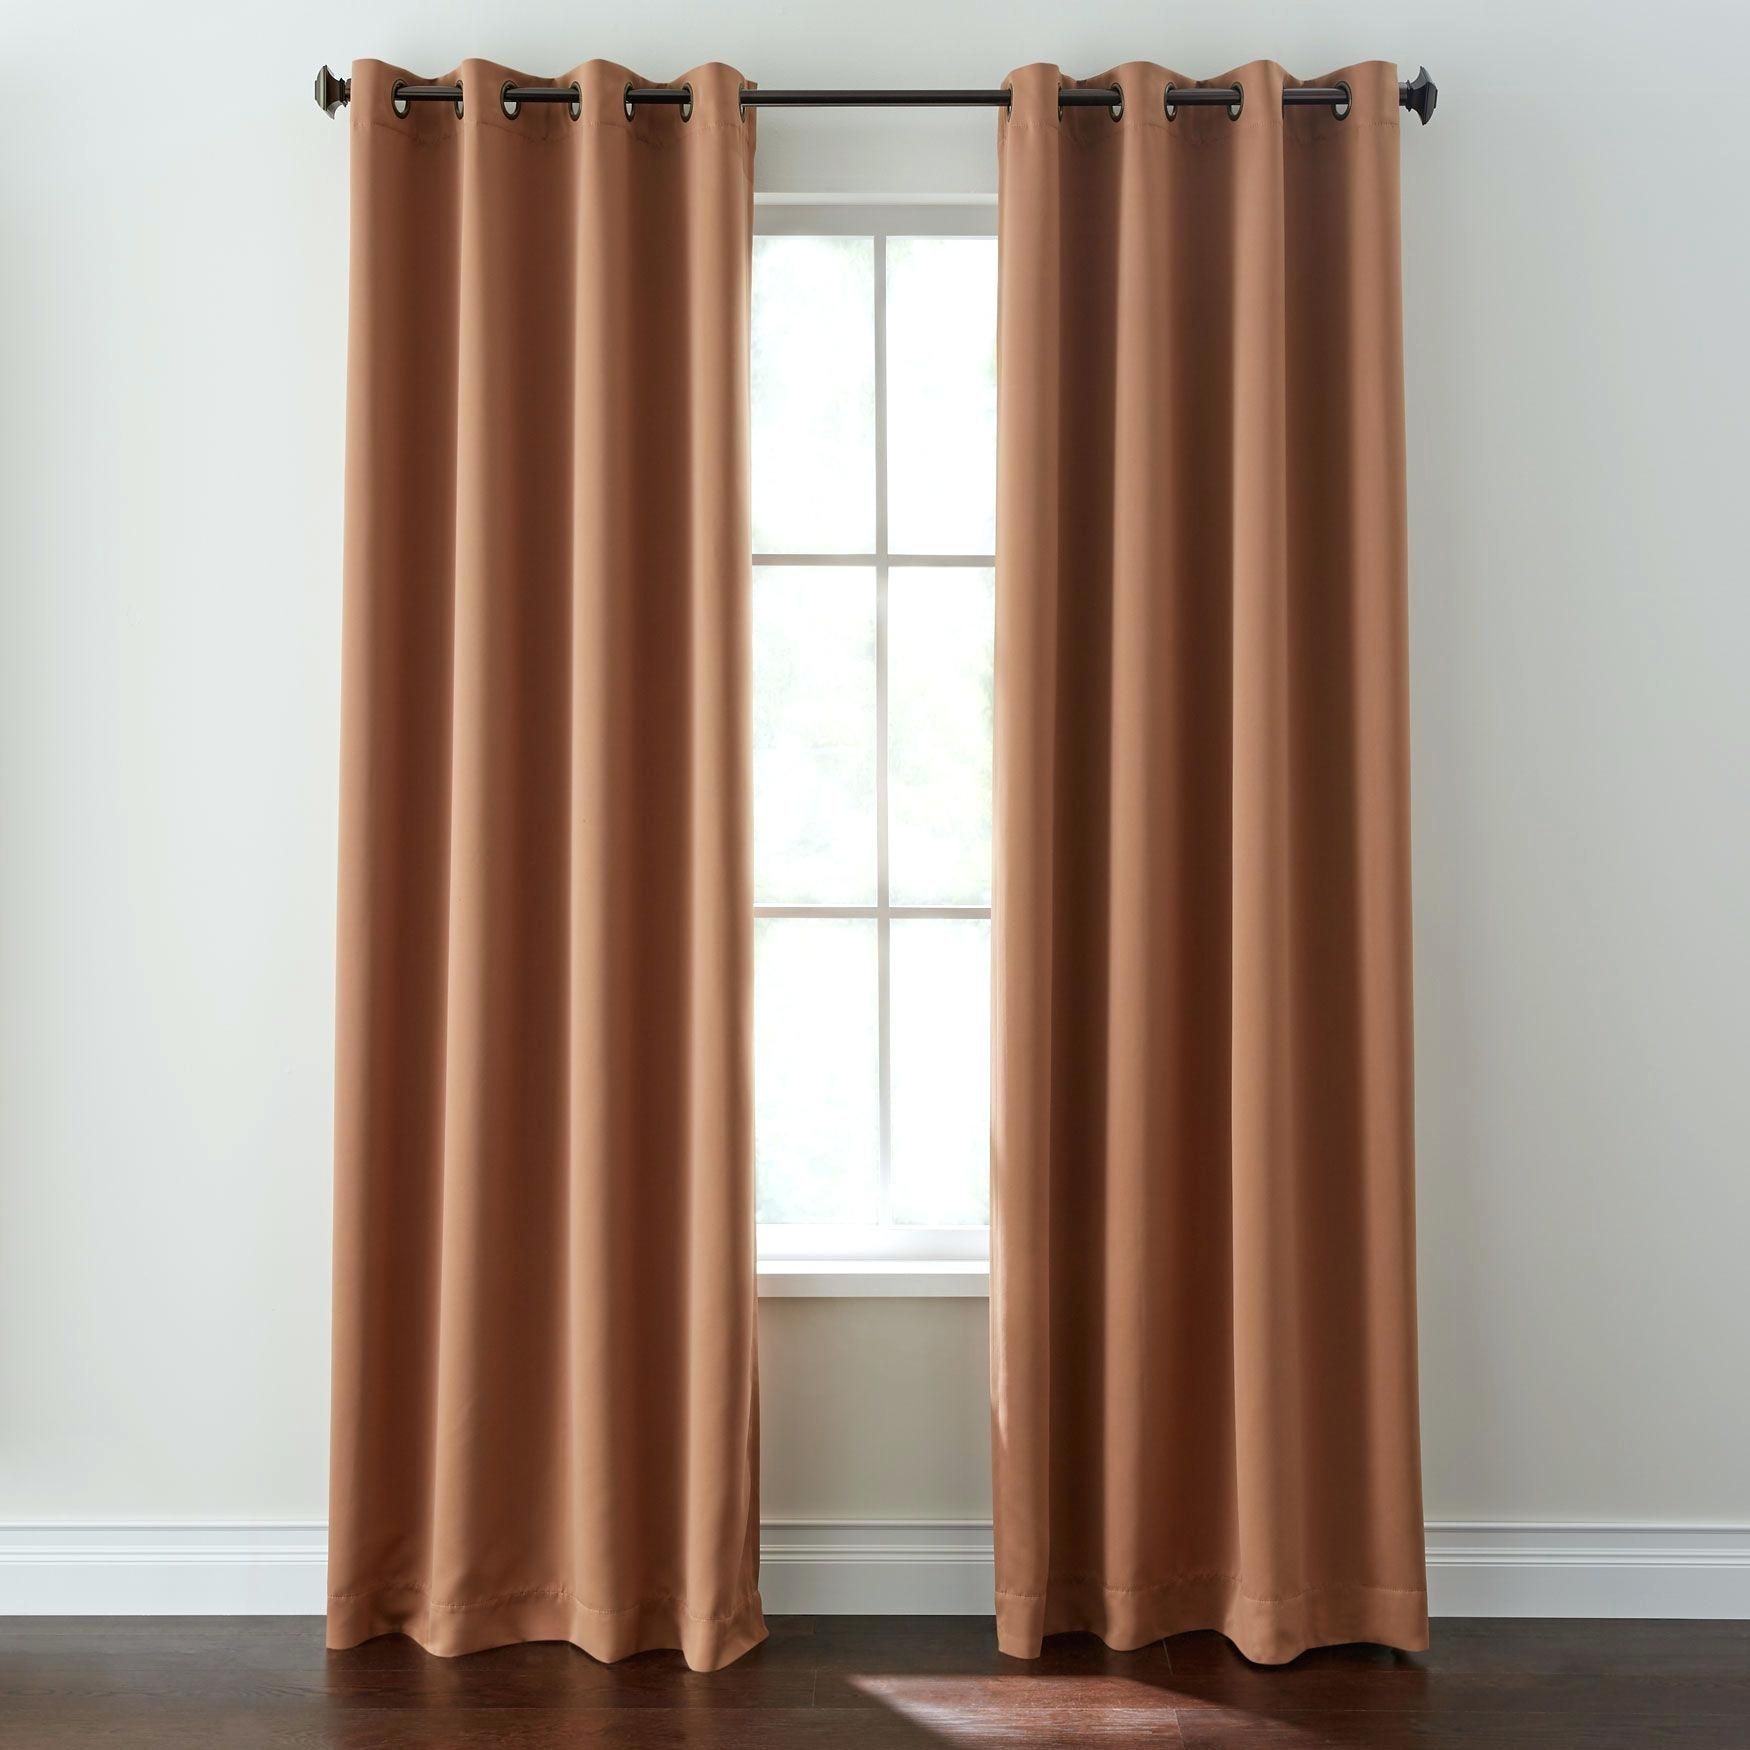 Marvellous Grommet Curtains Outdoor On Sale Blackout Diy inside Ultimate Blackout Short Length Grommet Panels (Image 18 of 30)